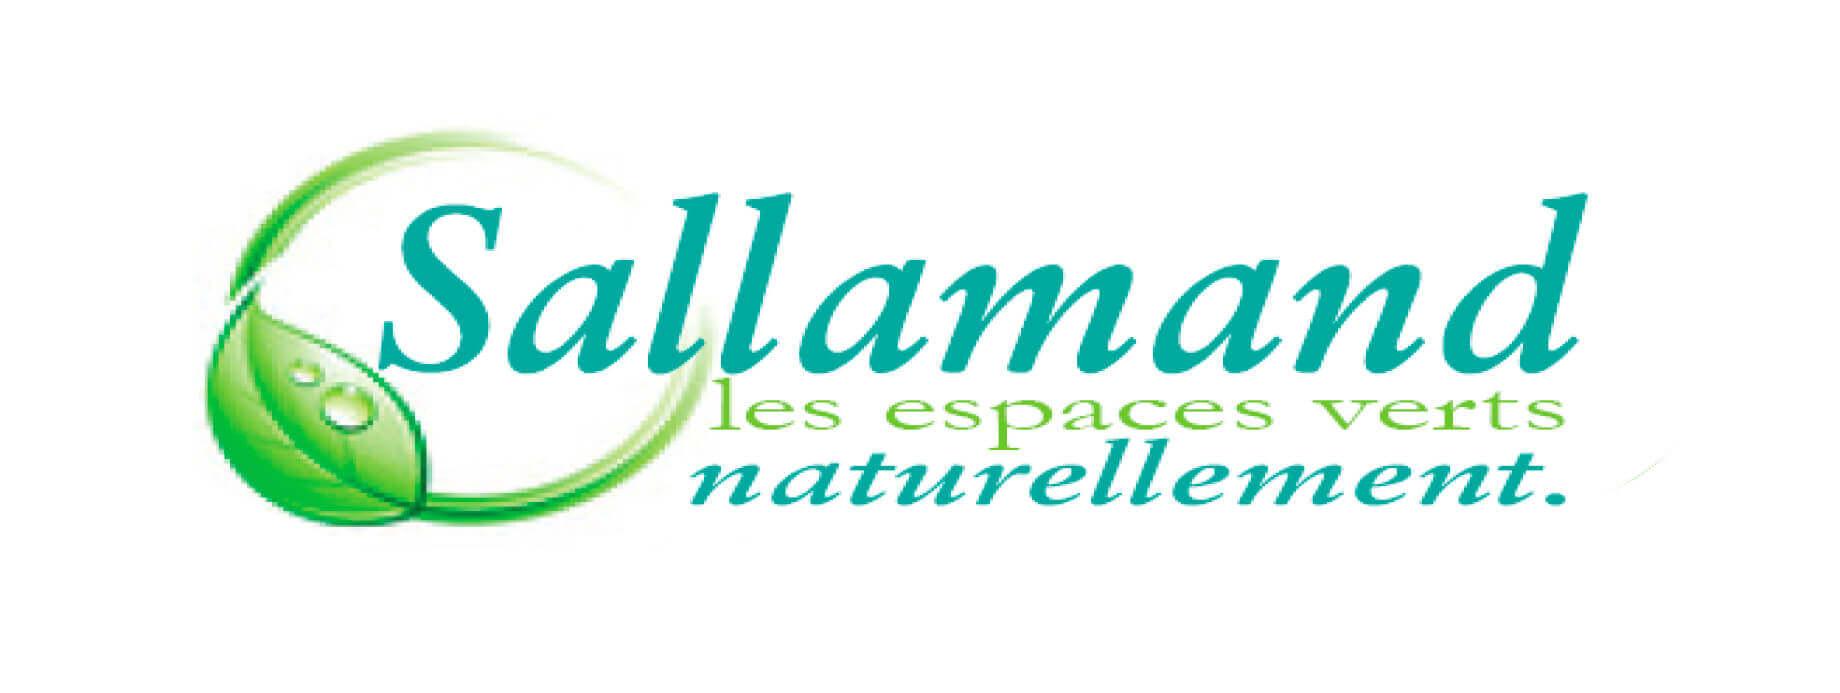 Entreprise Sallamand, Espaces verts - Caluire et Cuire